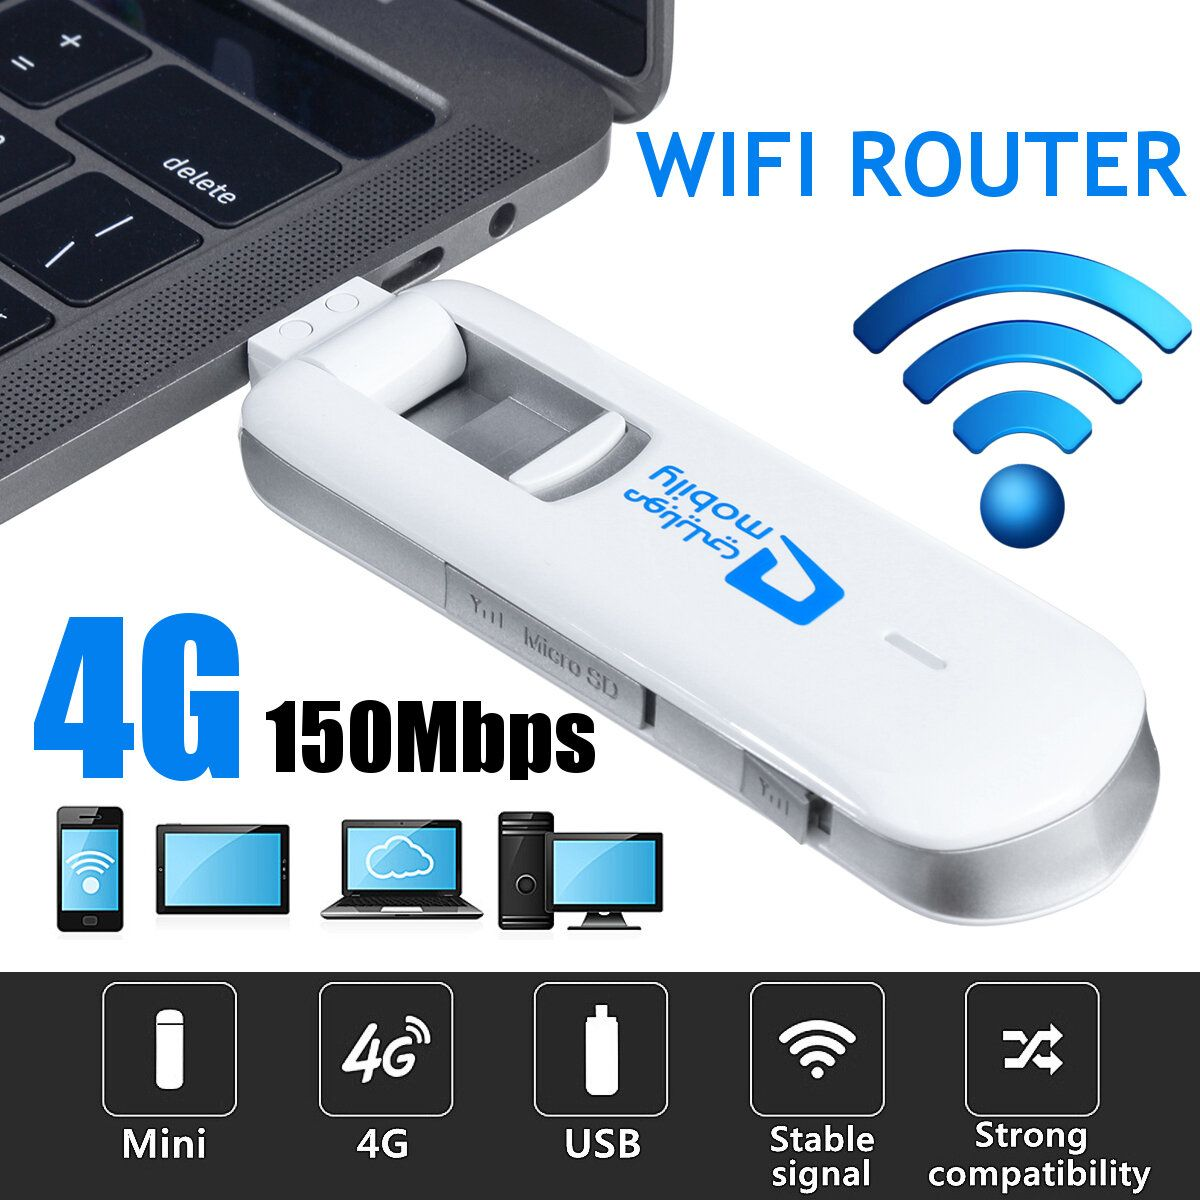 USB 4G LTE Dongle WiFi Router 150Mbps Mobile Broadband Modem B1/B3 PLUG & PLAY